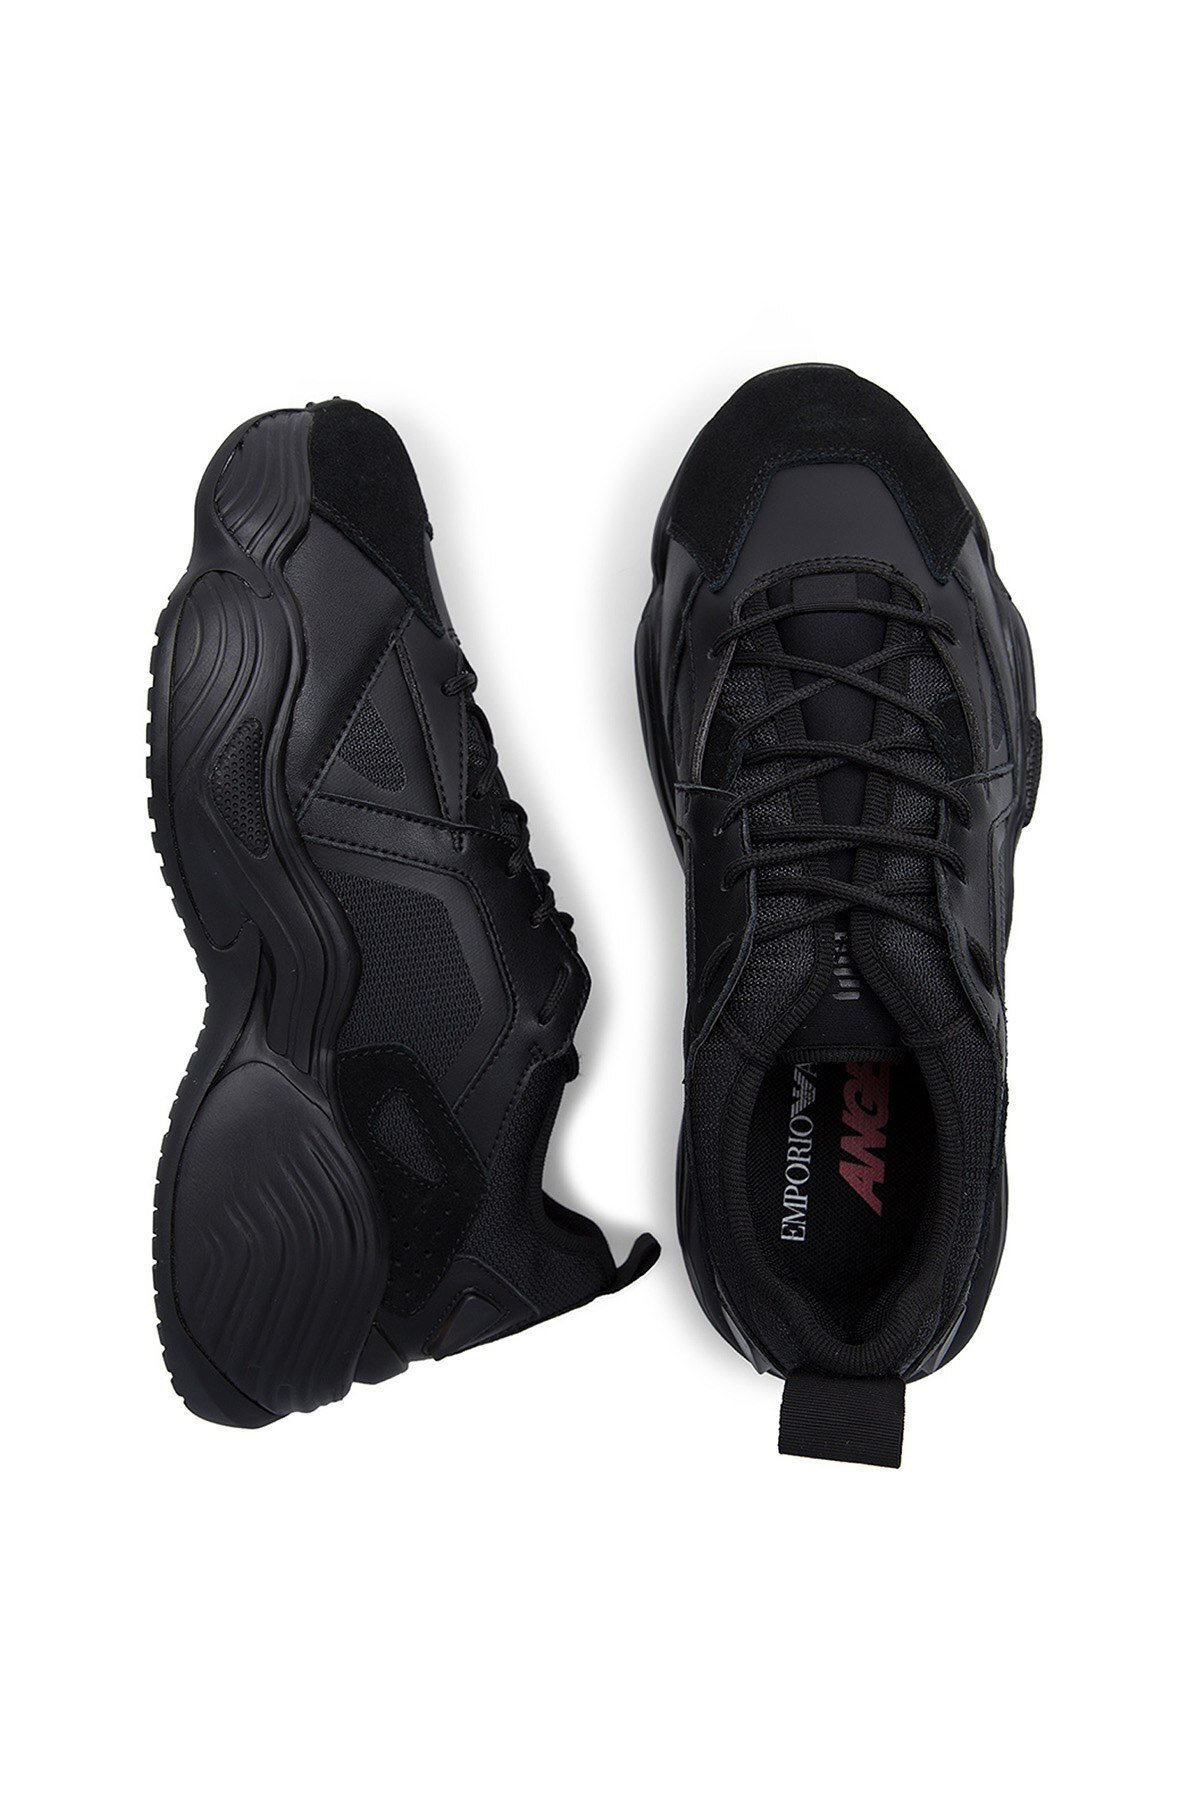 Emporio Armani Erkek Ayakkabı X4X286 XM072 R122 SİYAH